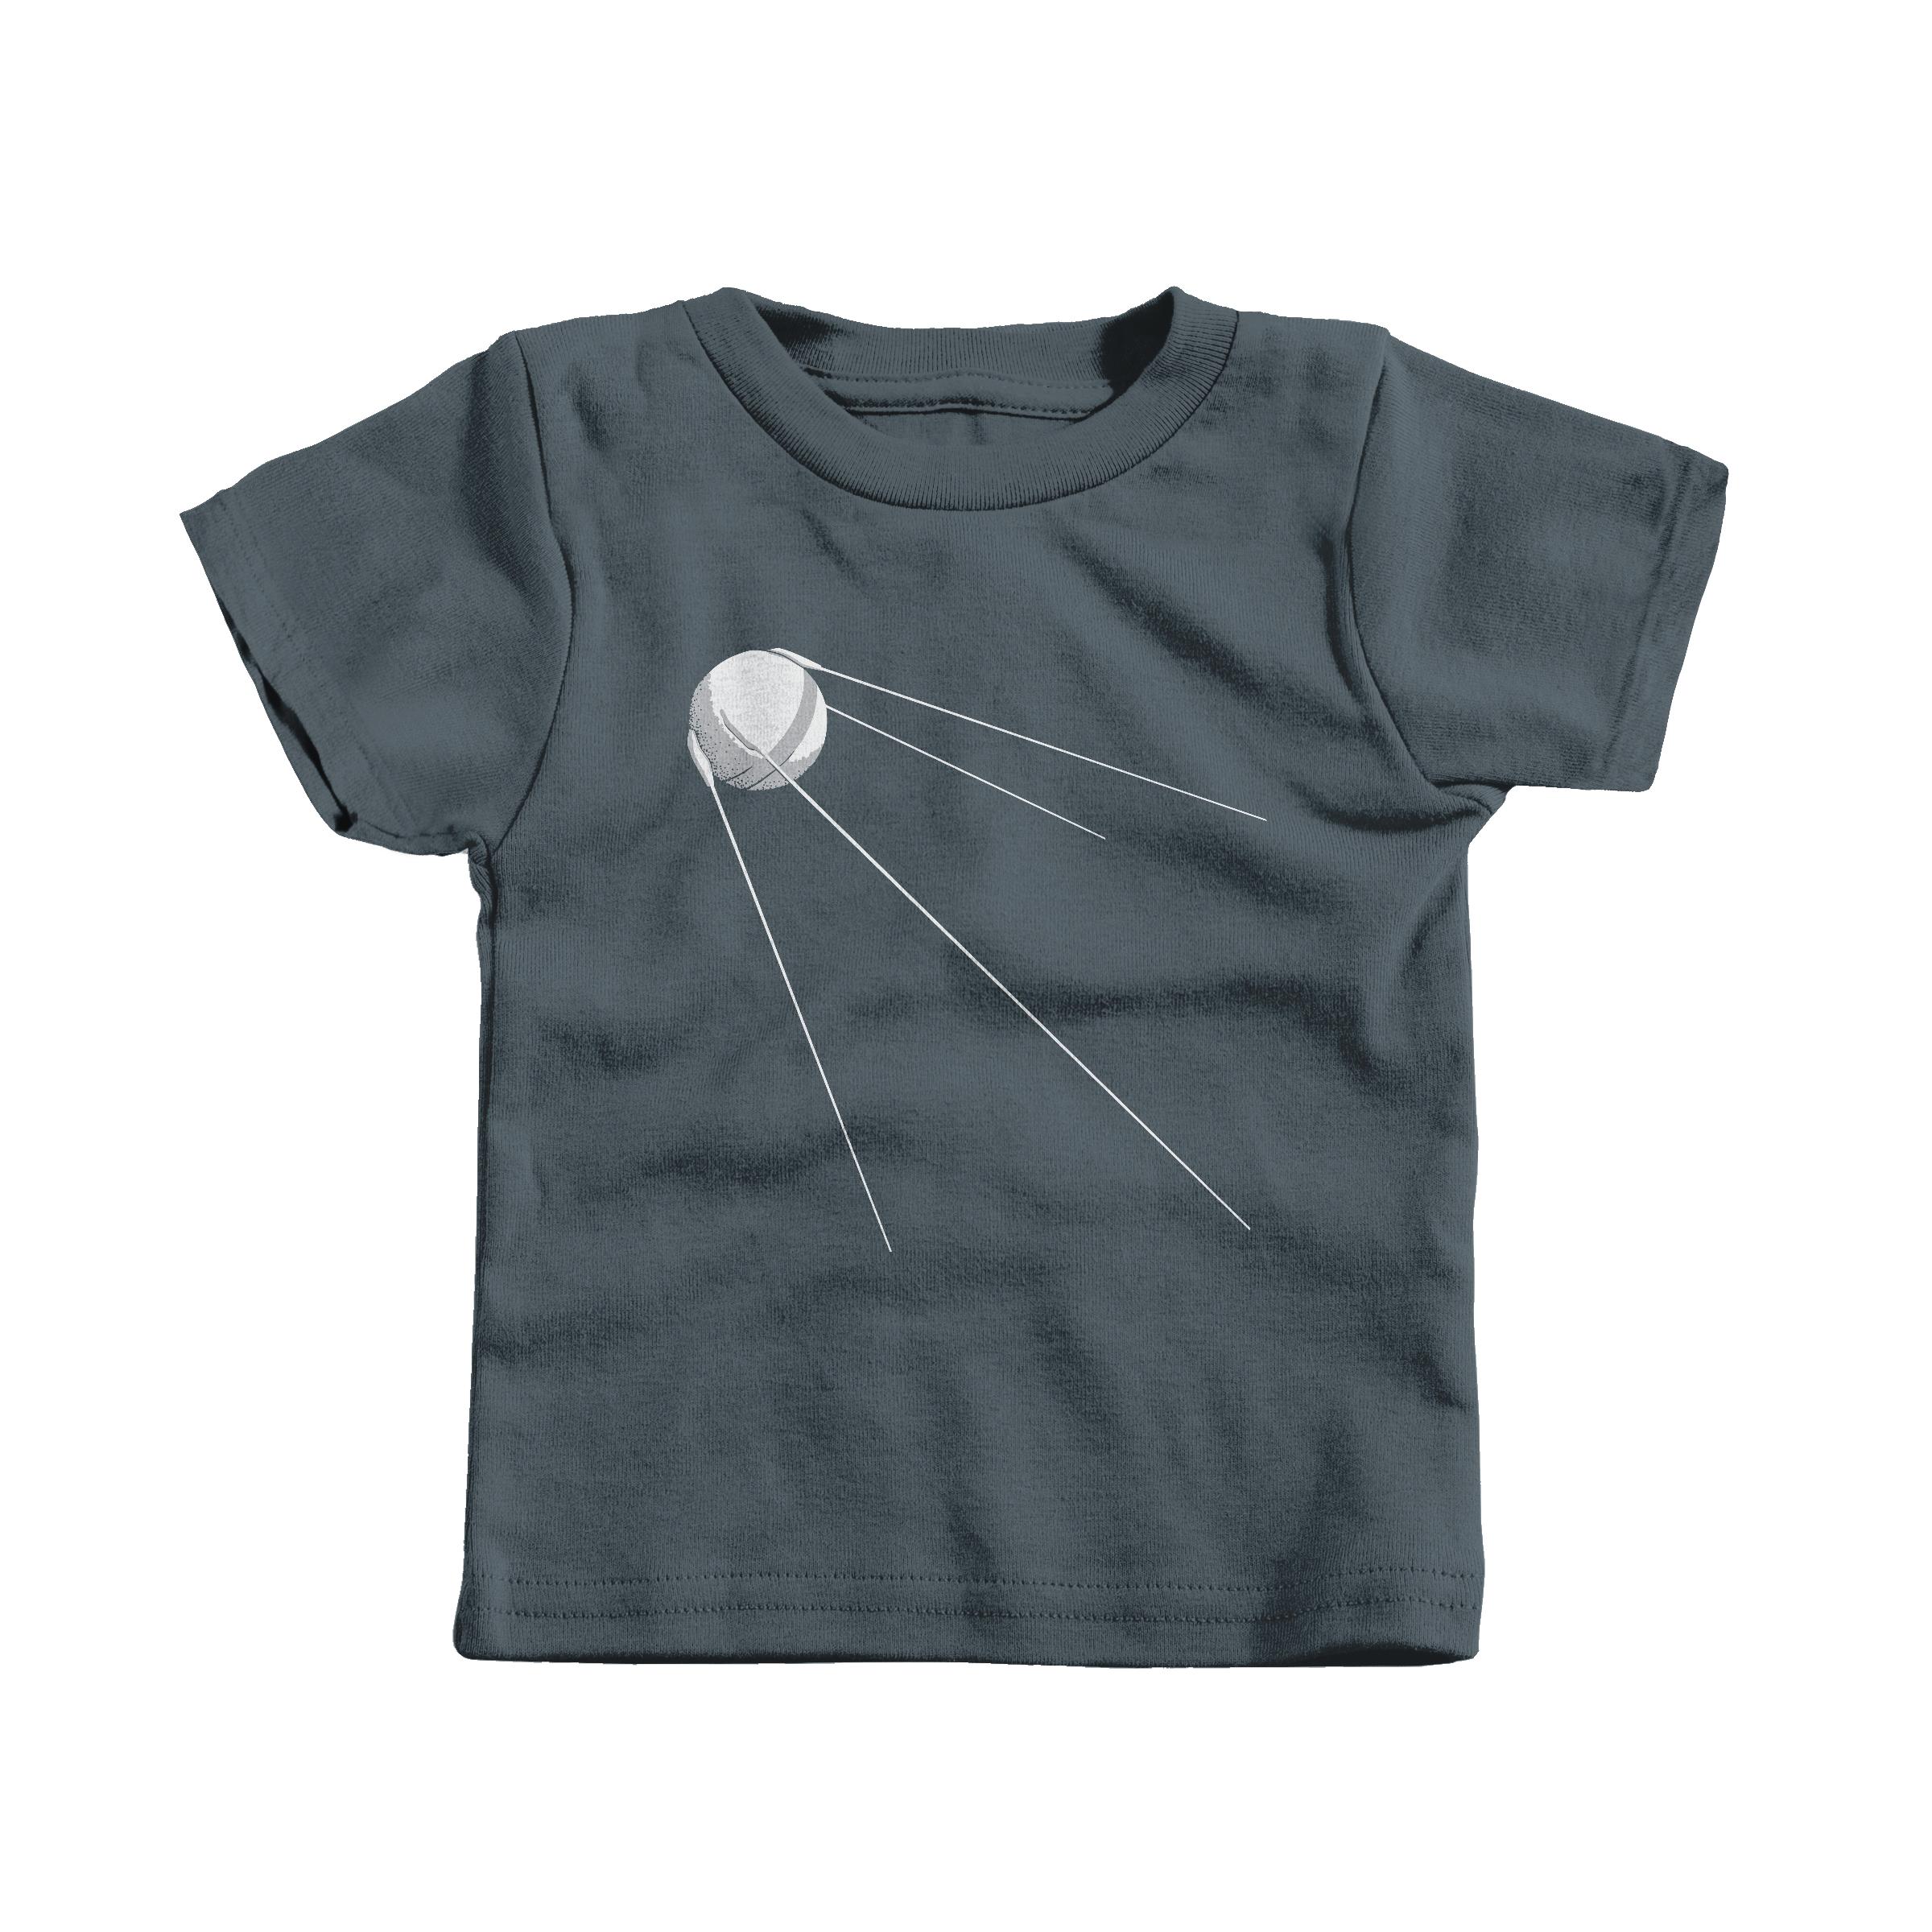 Sputnik 1 Charcoal (T-Shirt)